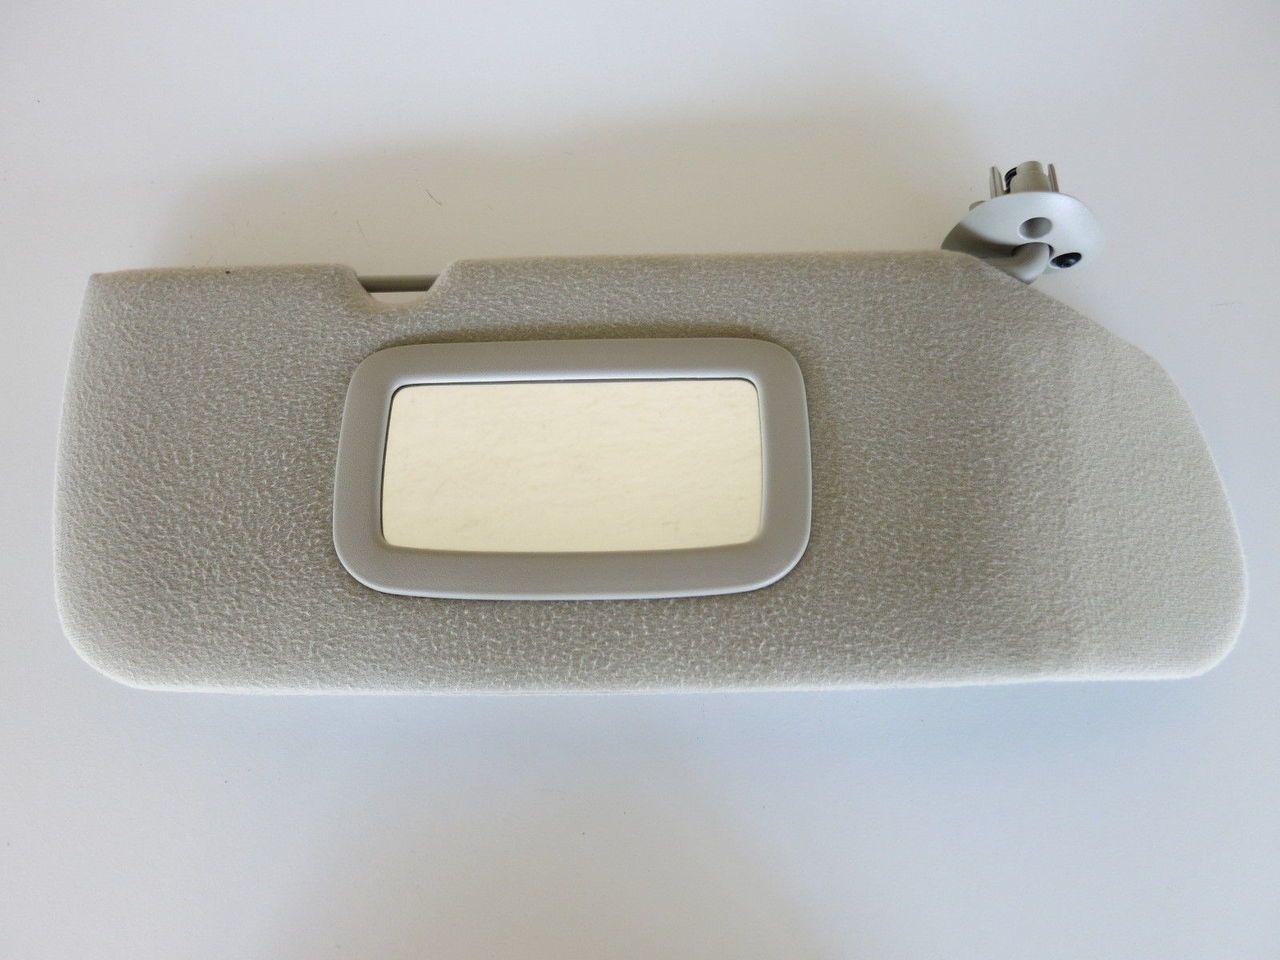 03 07 Gmc Sierra 1500 Right Passenger Side Interior Sun Visor Sunvisor Gmc Sierra 1500 Visor Gmc